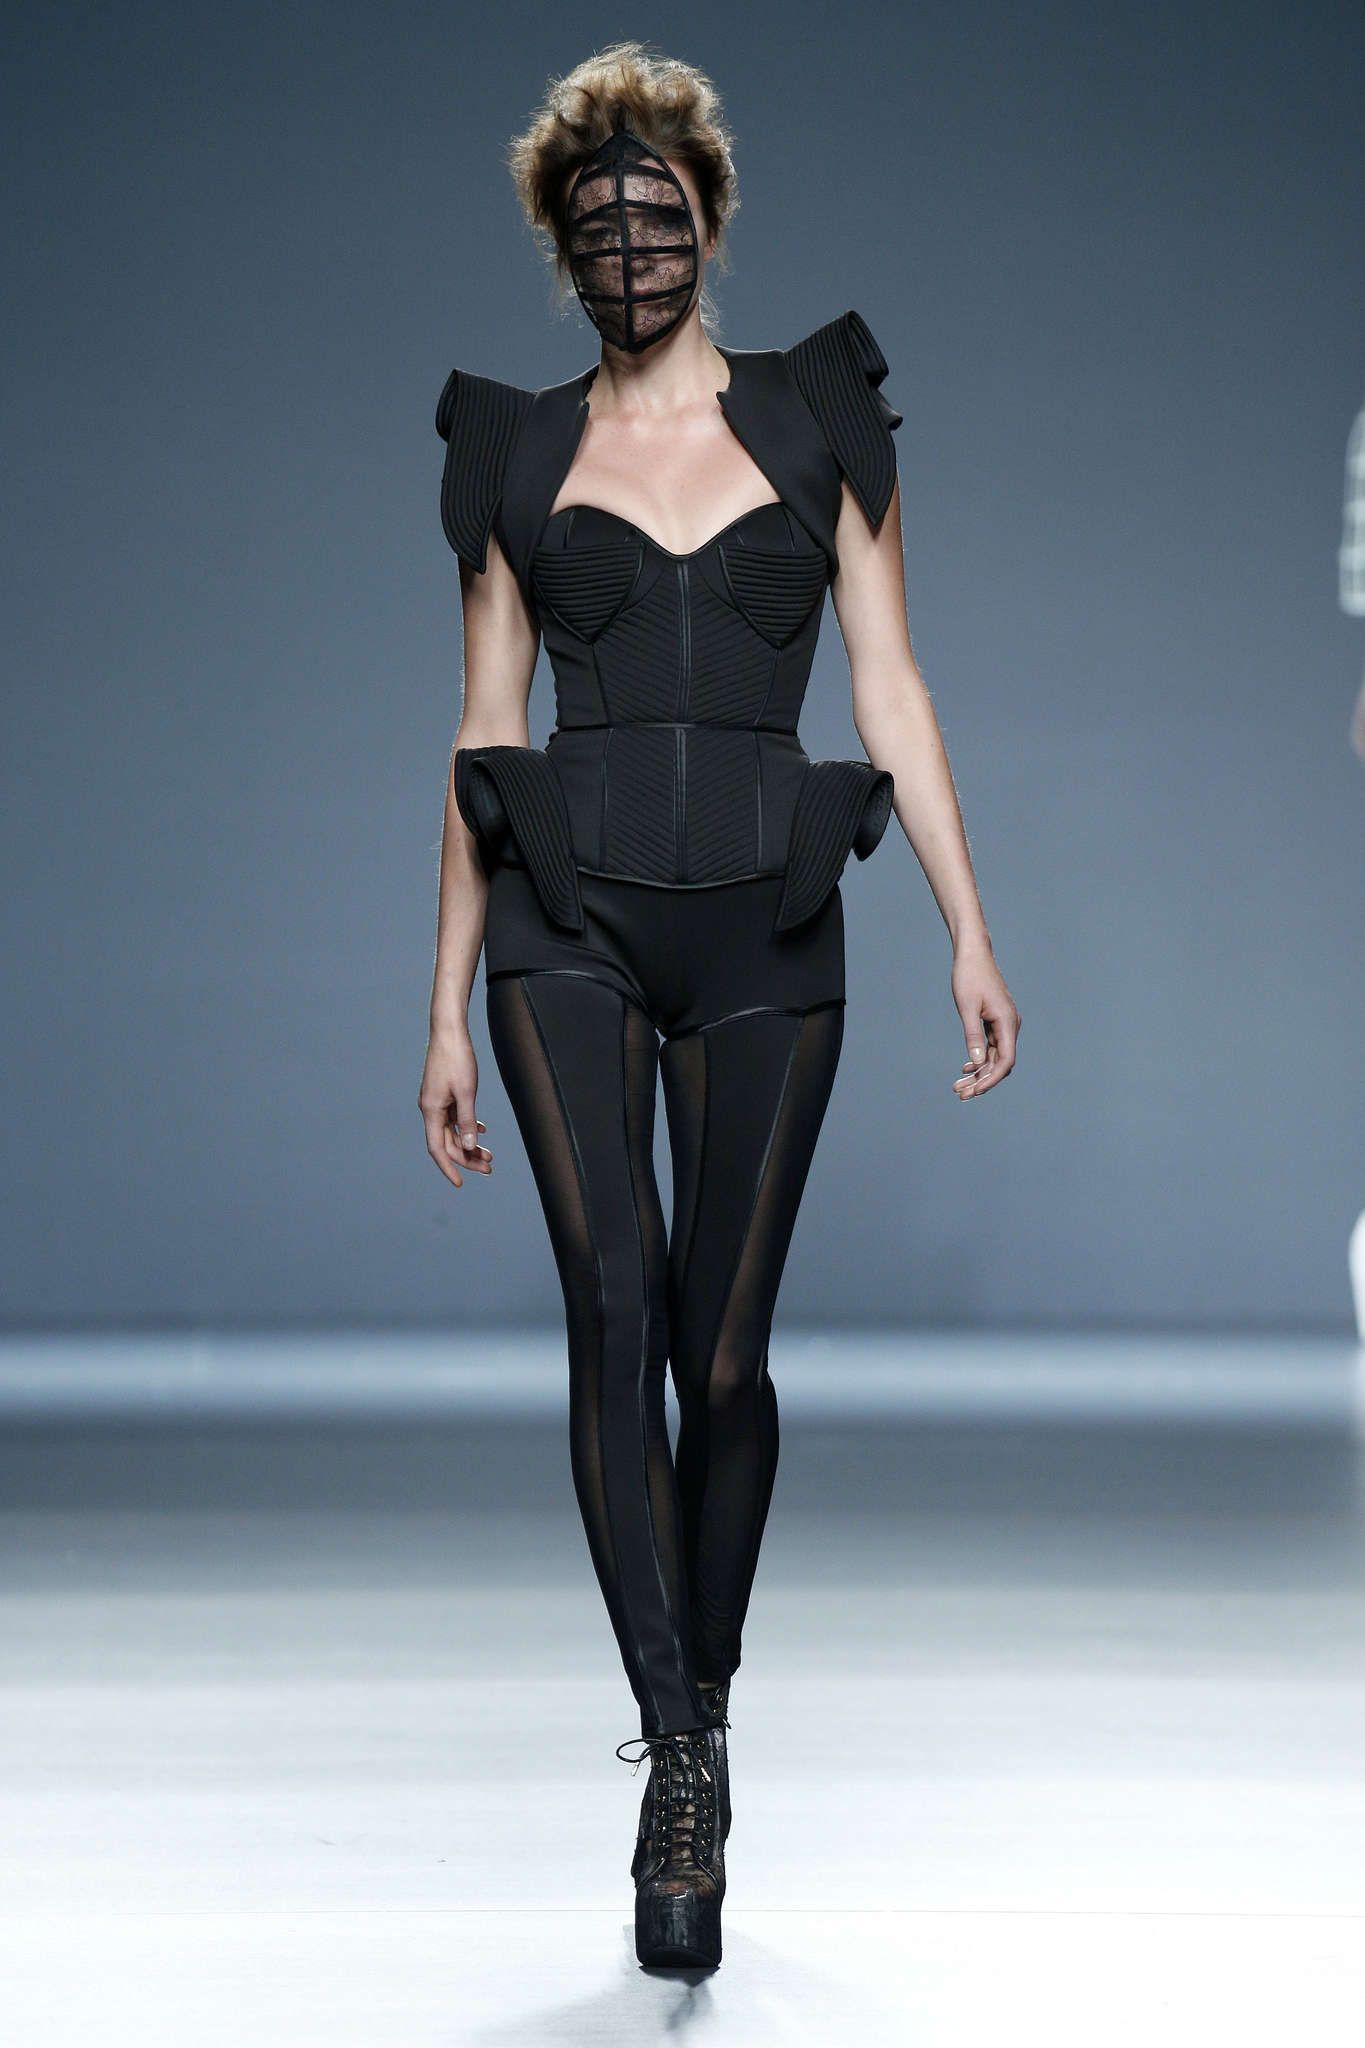 Maya Hansen Primavera/Verano 2015, Womenswear - Desfiles (#20002)